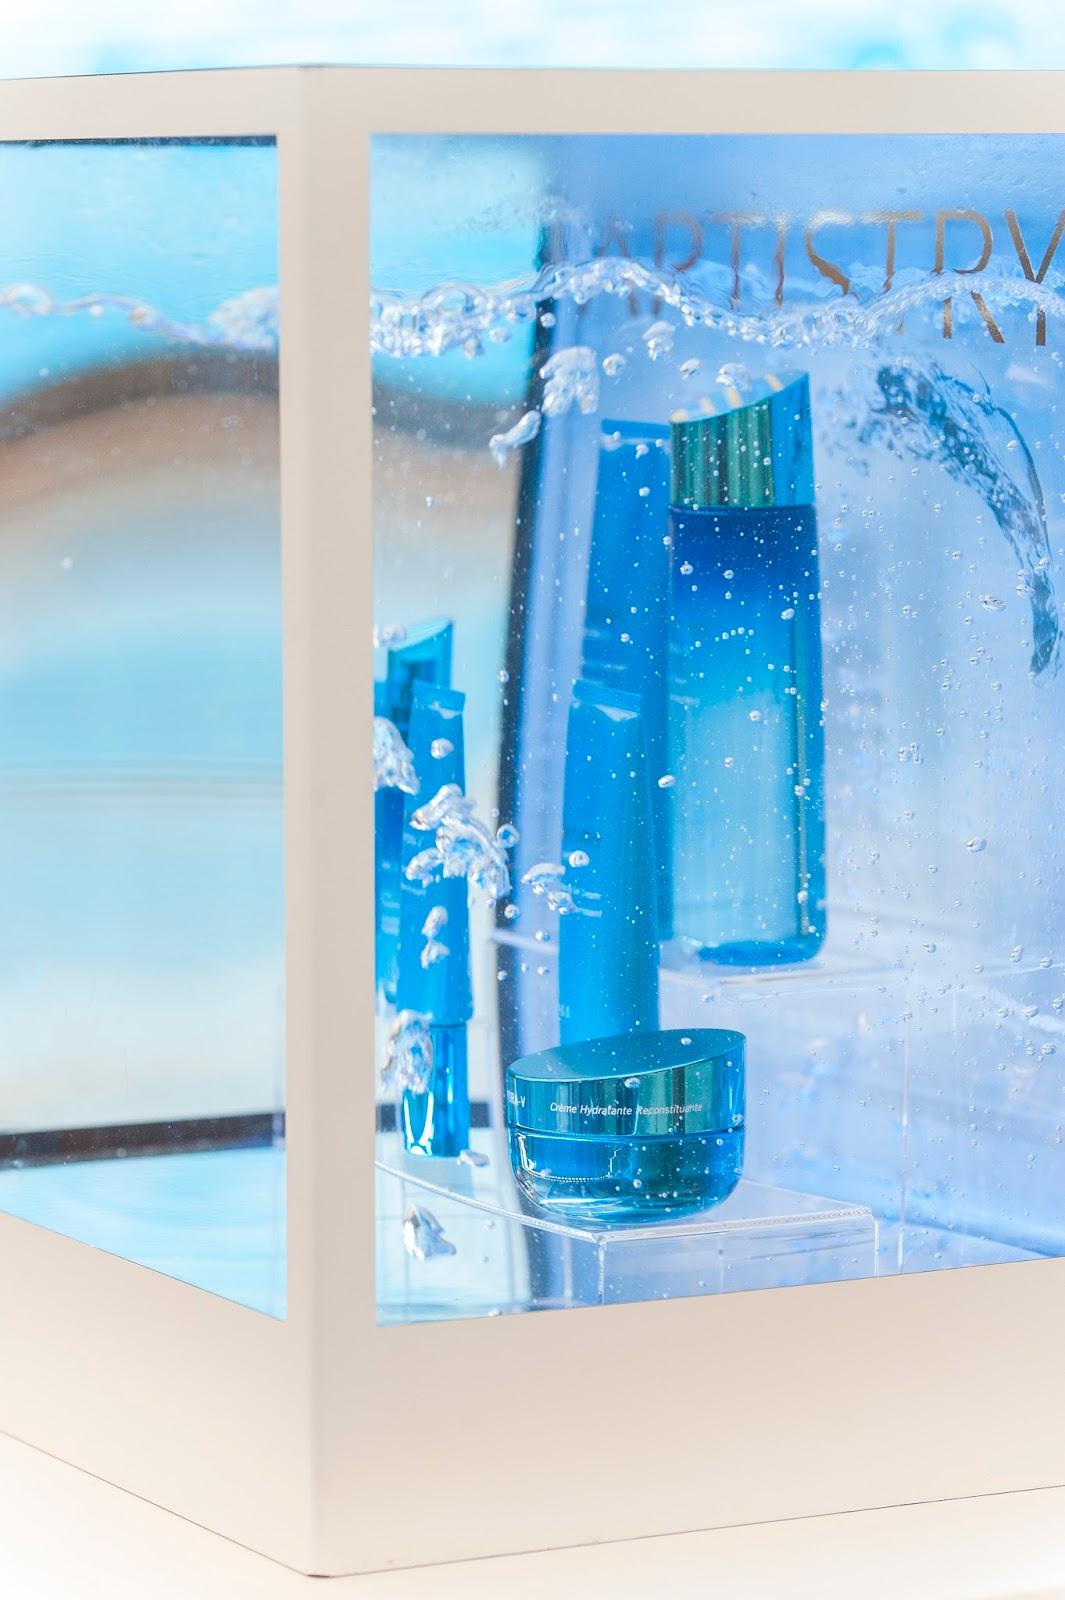 ARTISTRY Hydra-V, презентация ARTISTRY, ресторан Eliziy отзывы, увлажняющие средство для кожи, питание кожи.